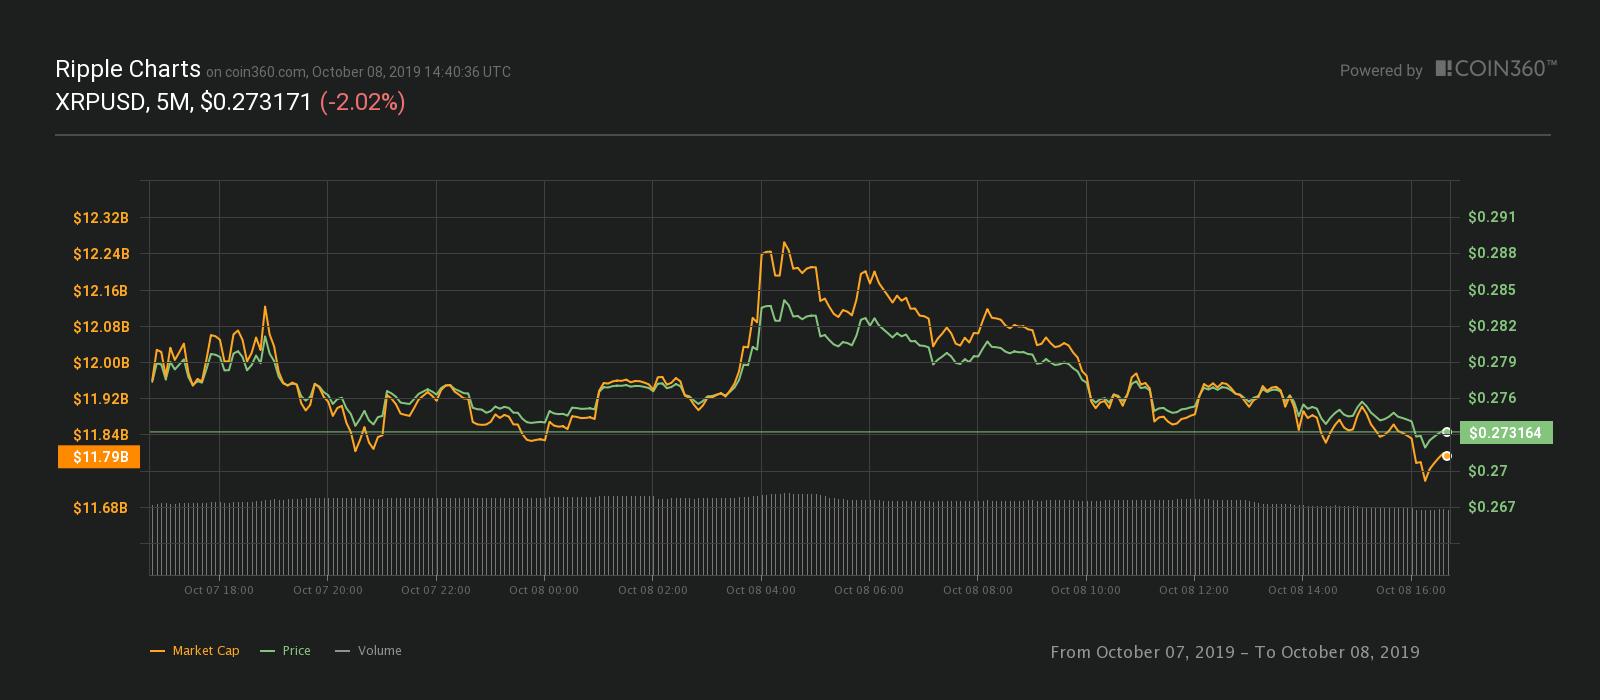 XRP's 24-hour price chart